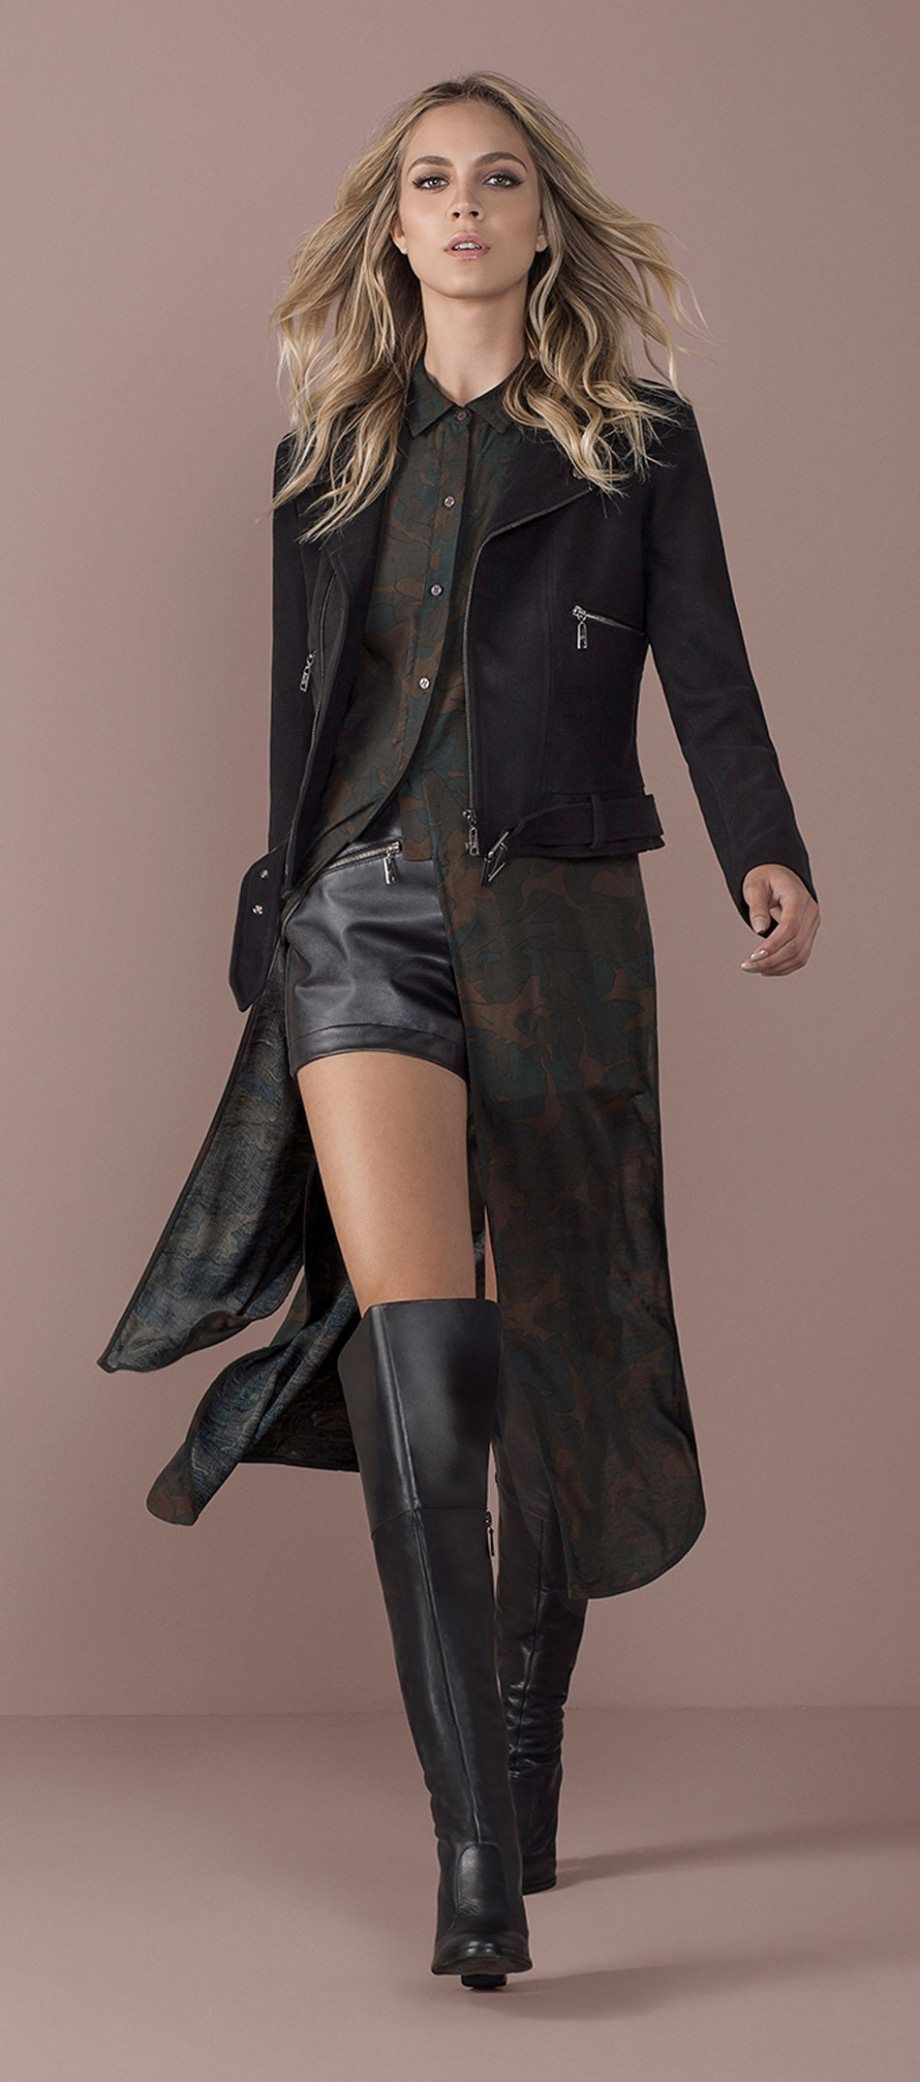 fb28a8650d shorts couro camisa longa militar jaqueta bota cano alto ate joelhos ...